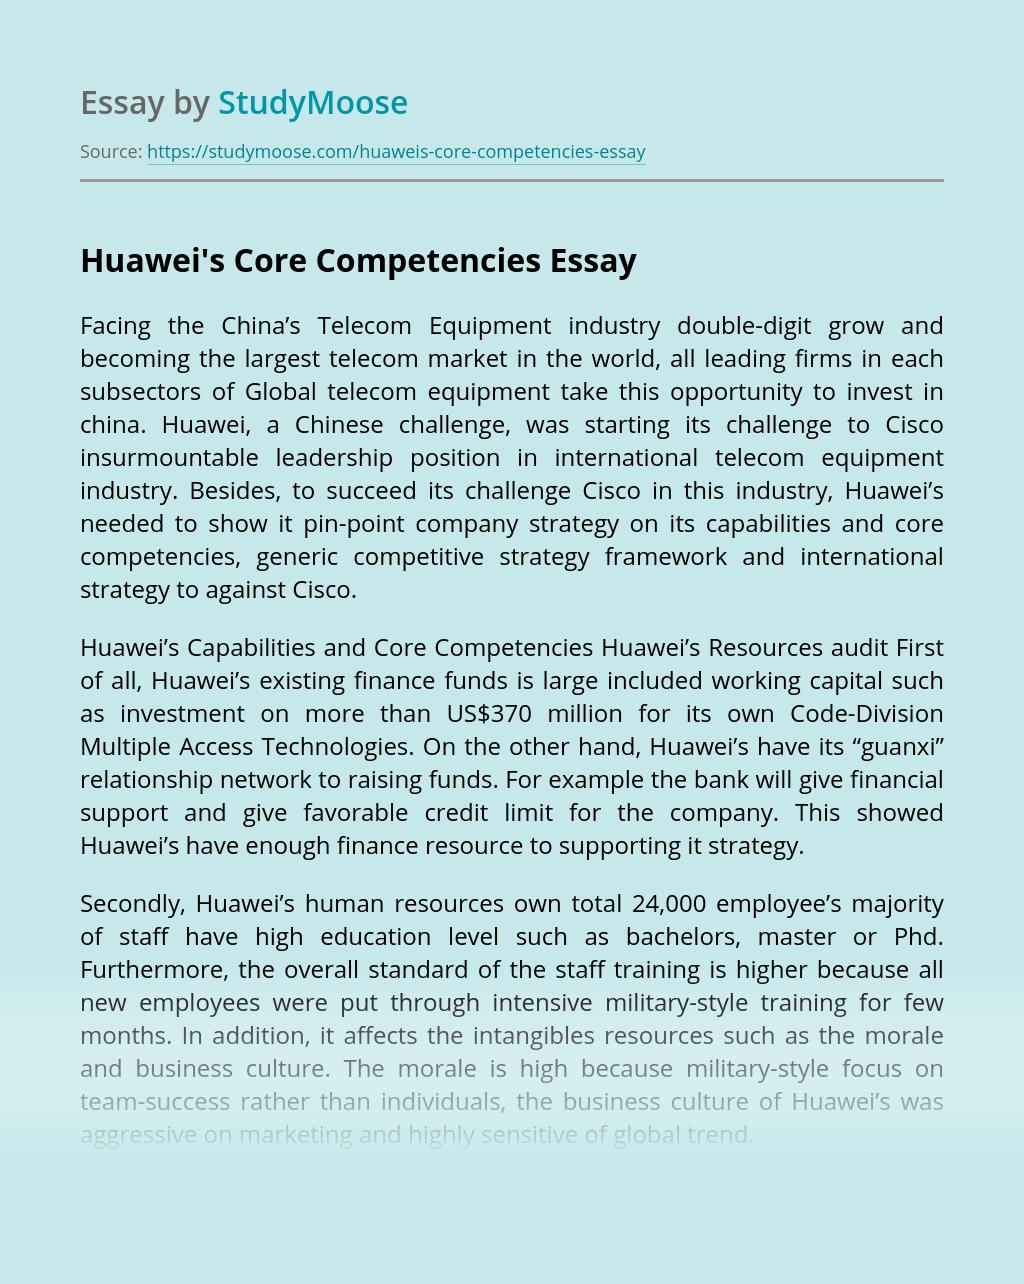 Huawei's Core Competencies